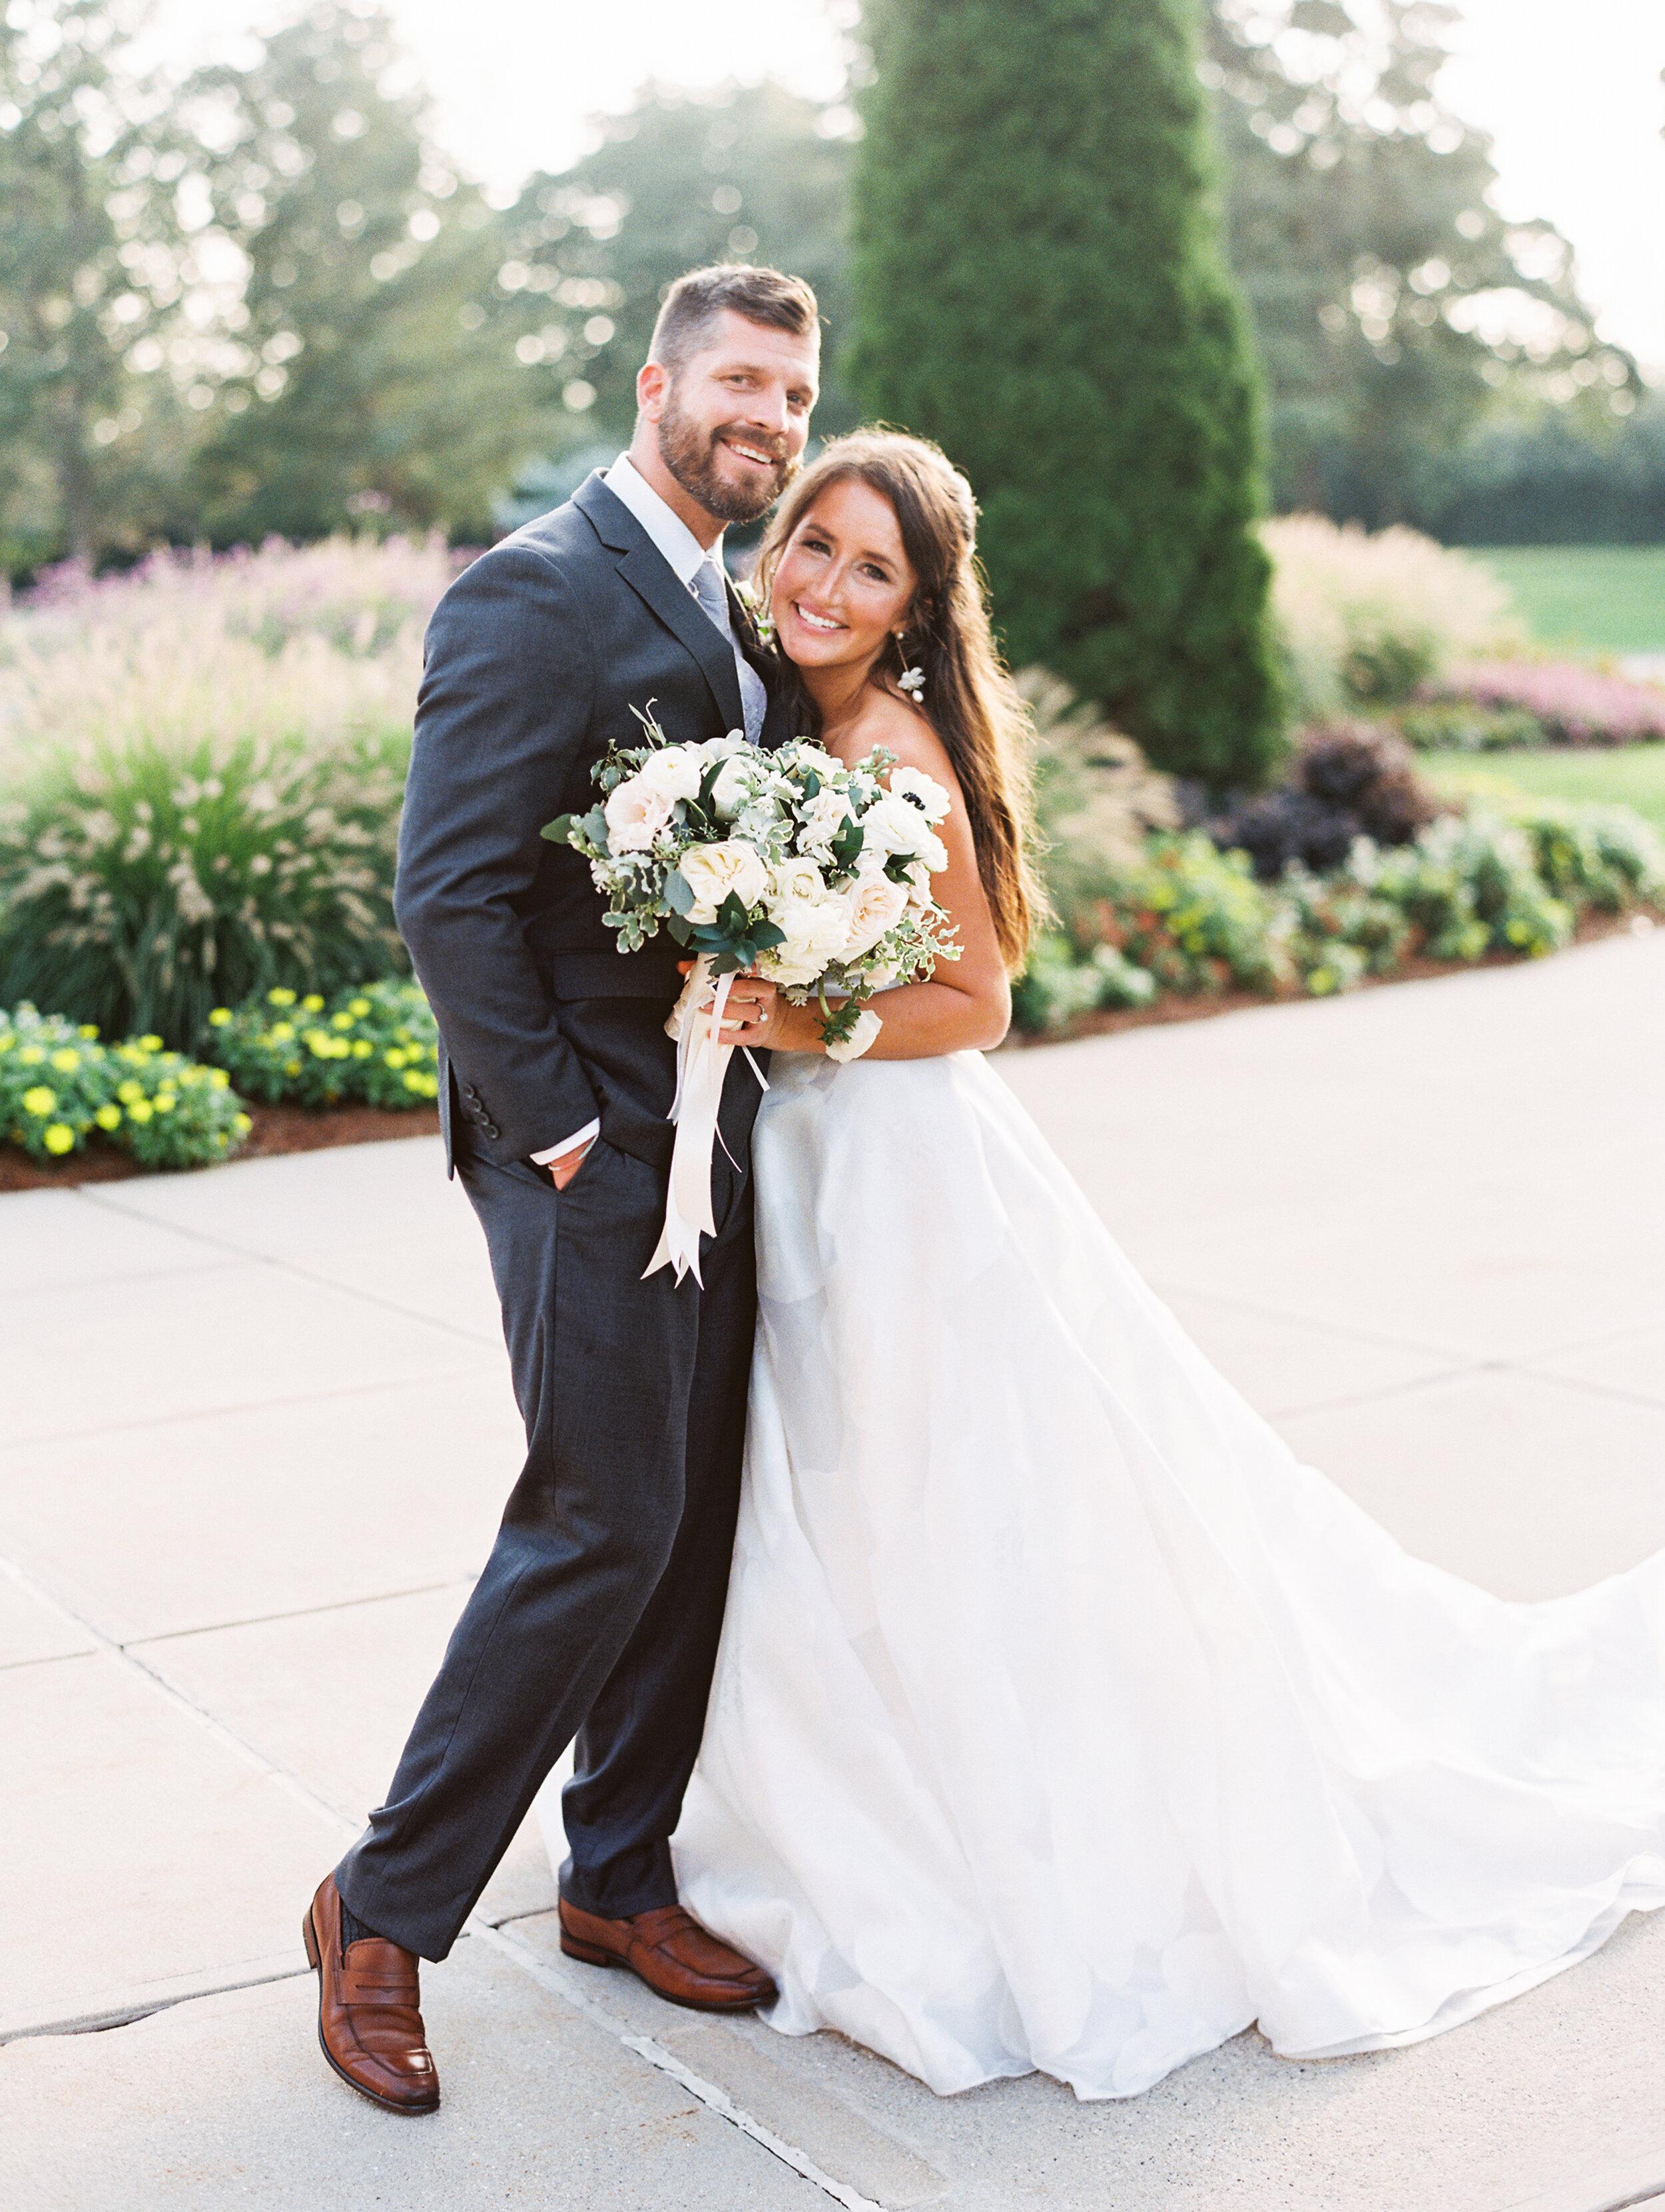 Kuiper+Wedding+Reception+Bridal+Party-146.jpg